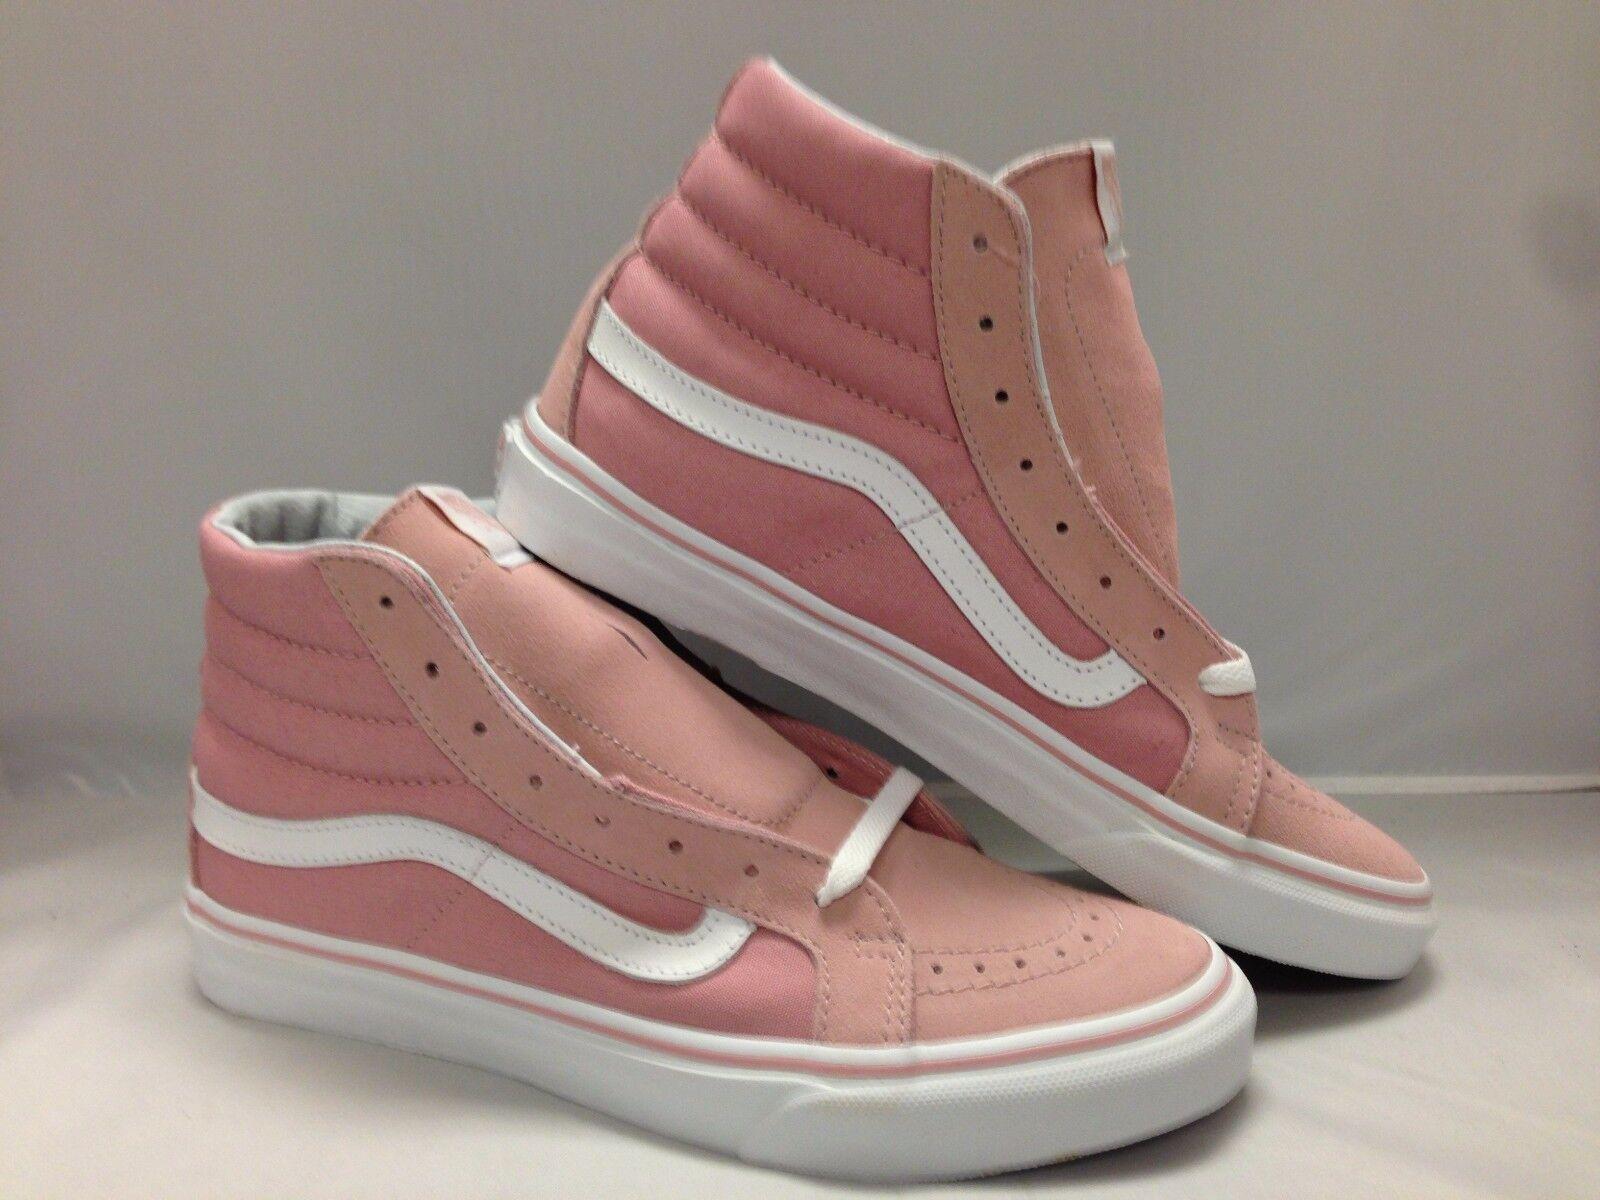 Vans Men's shoes  Sk8-Hi Slim''--(Zephyr)--True White